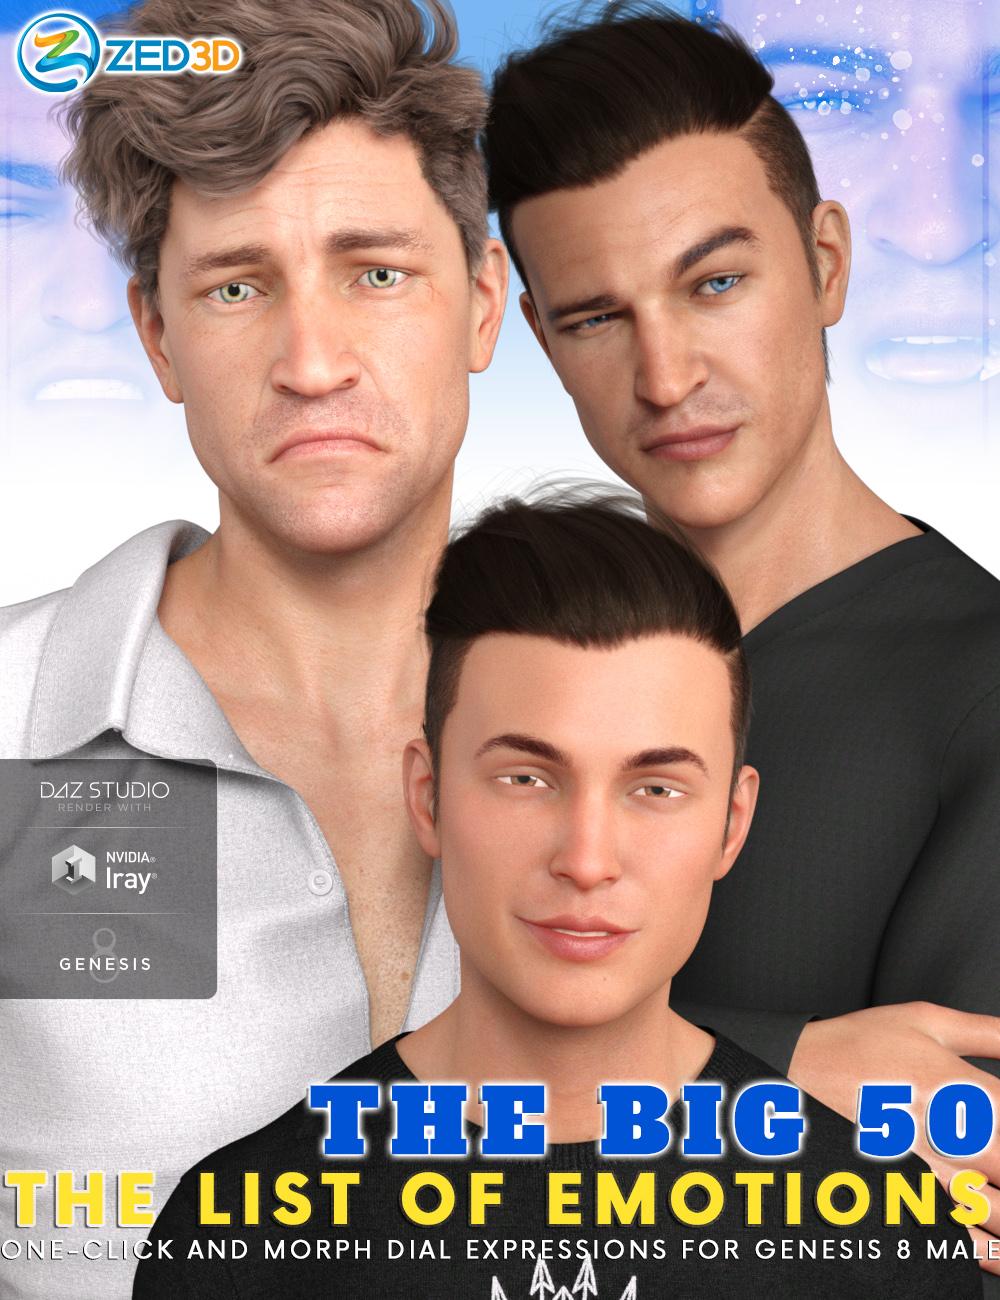 Z The Big 50 : The List of Emotions for Genesis 8 Male by: Zeddicuss, 3D Models by Daz 3D